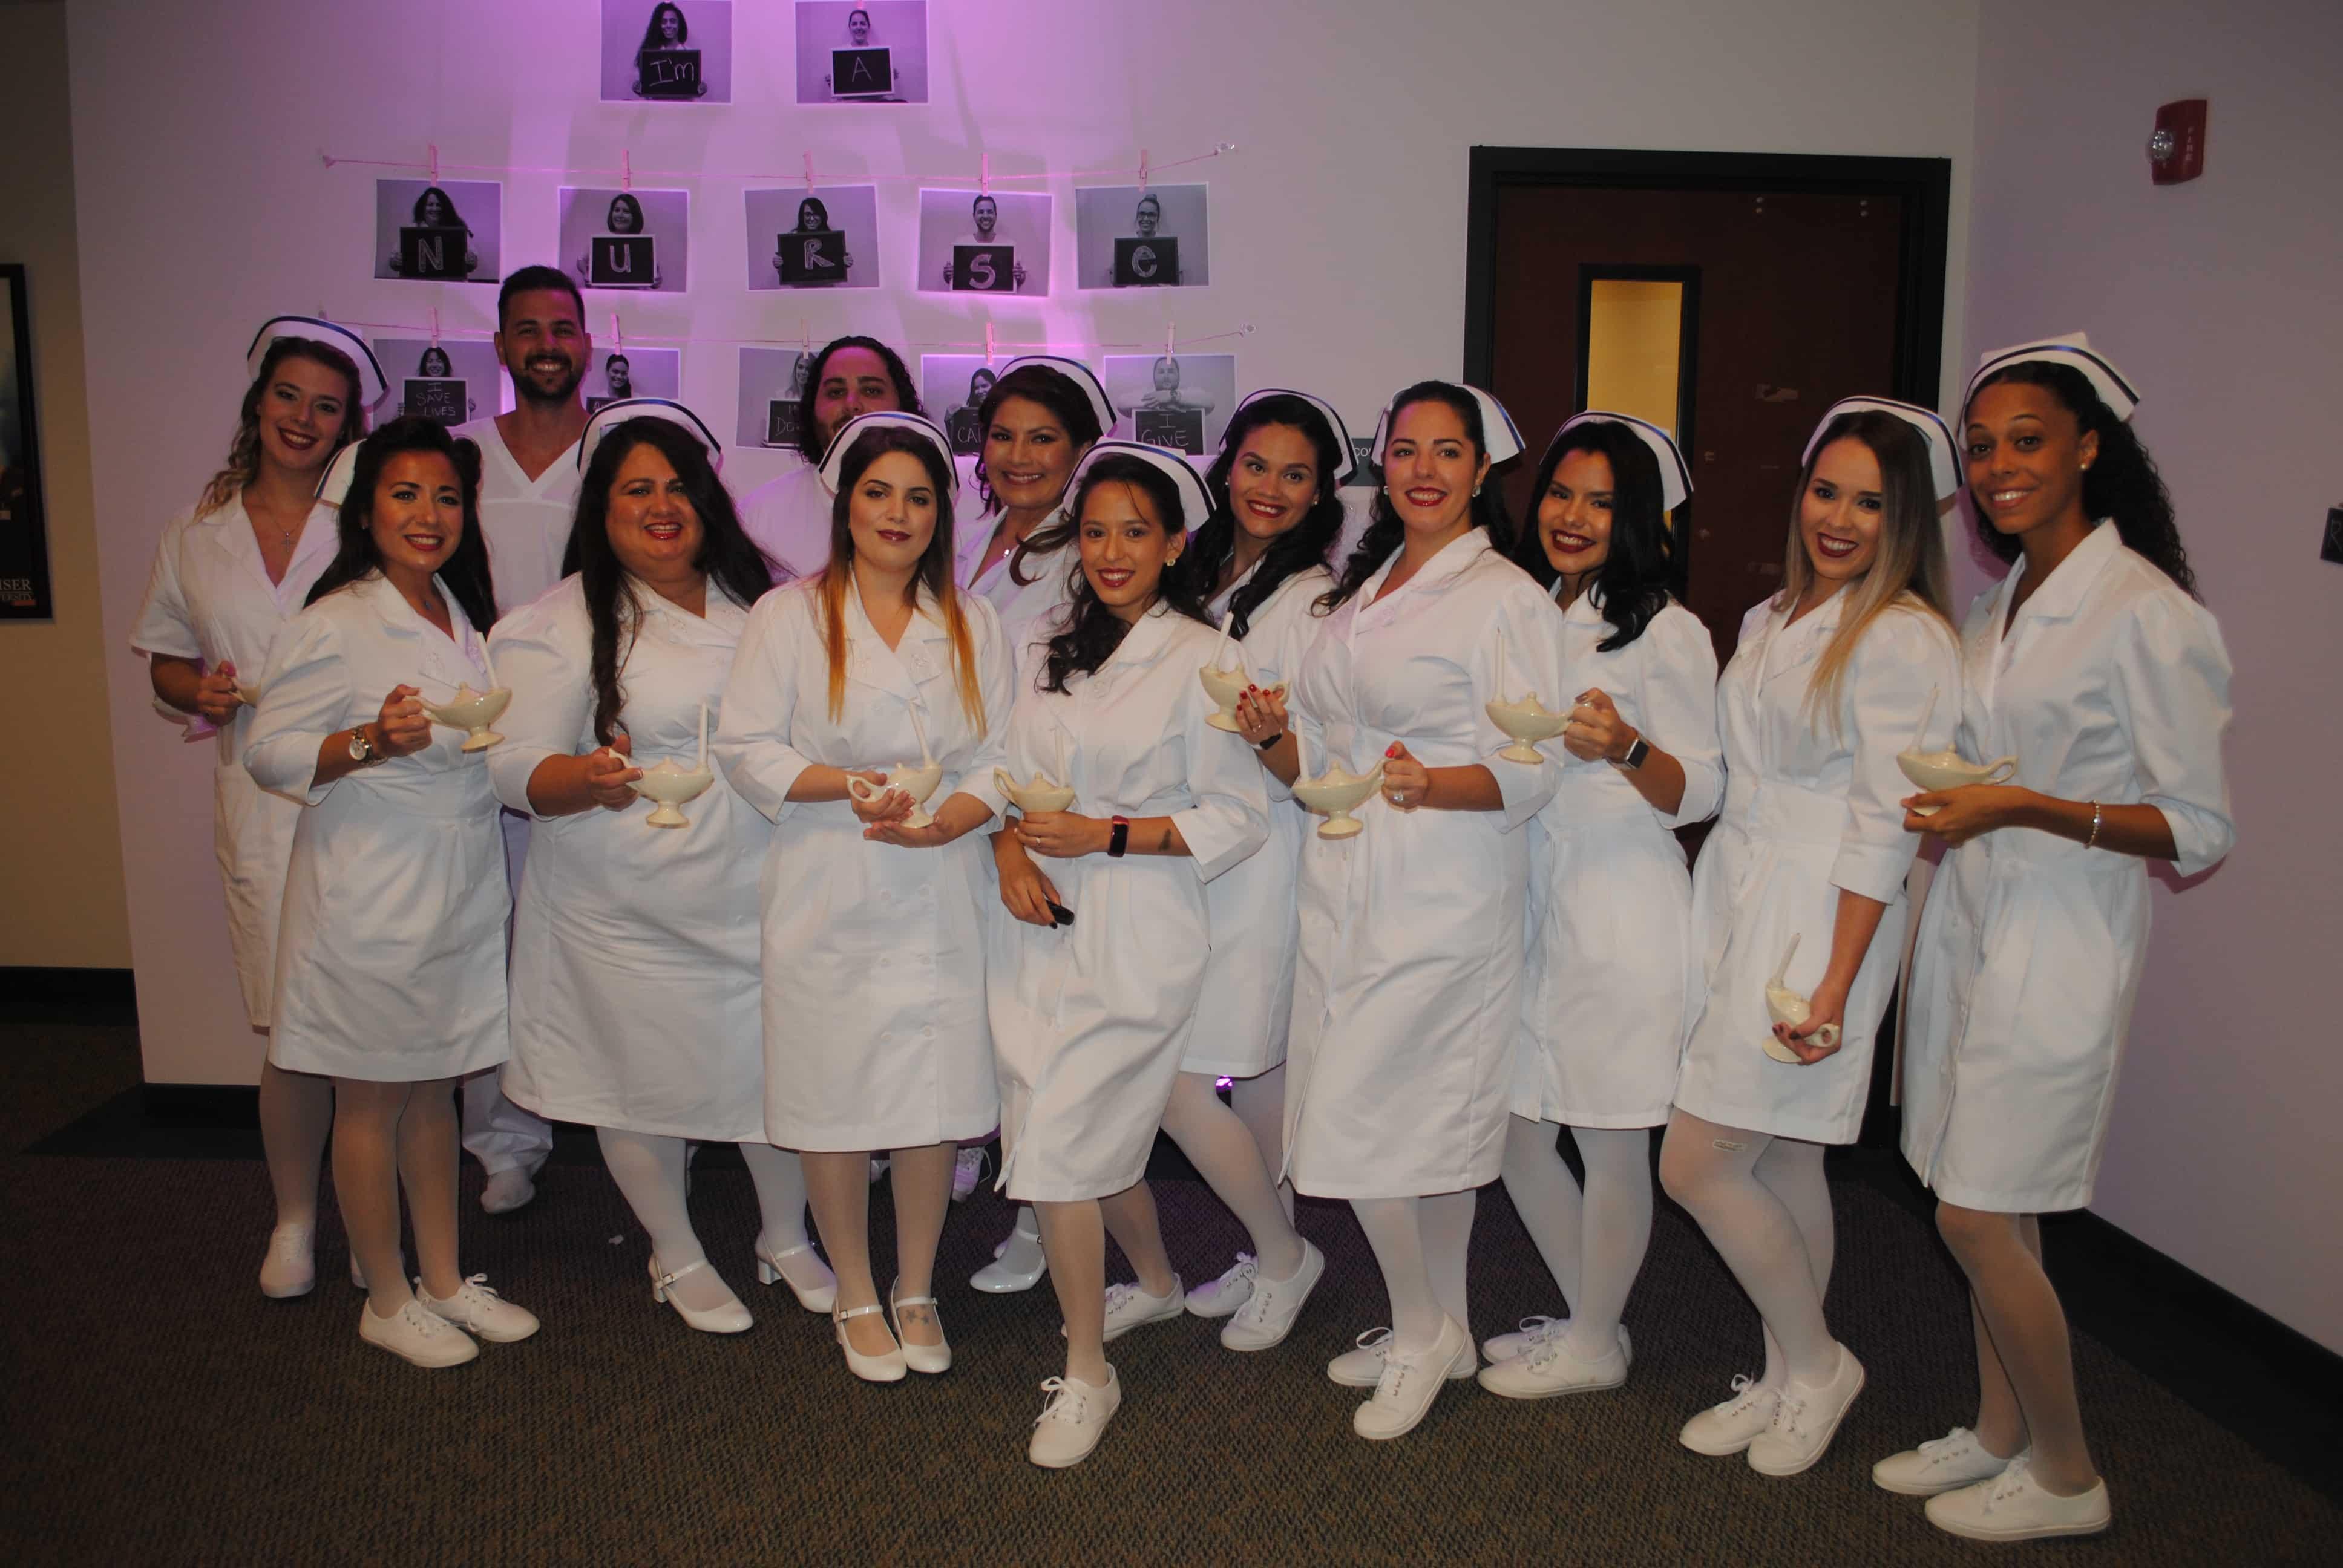 Miami Nursing Students Attending Pinning Ceremony